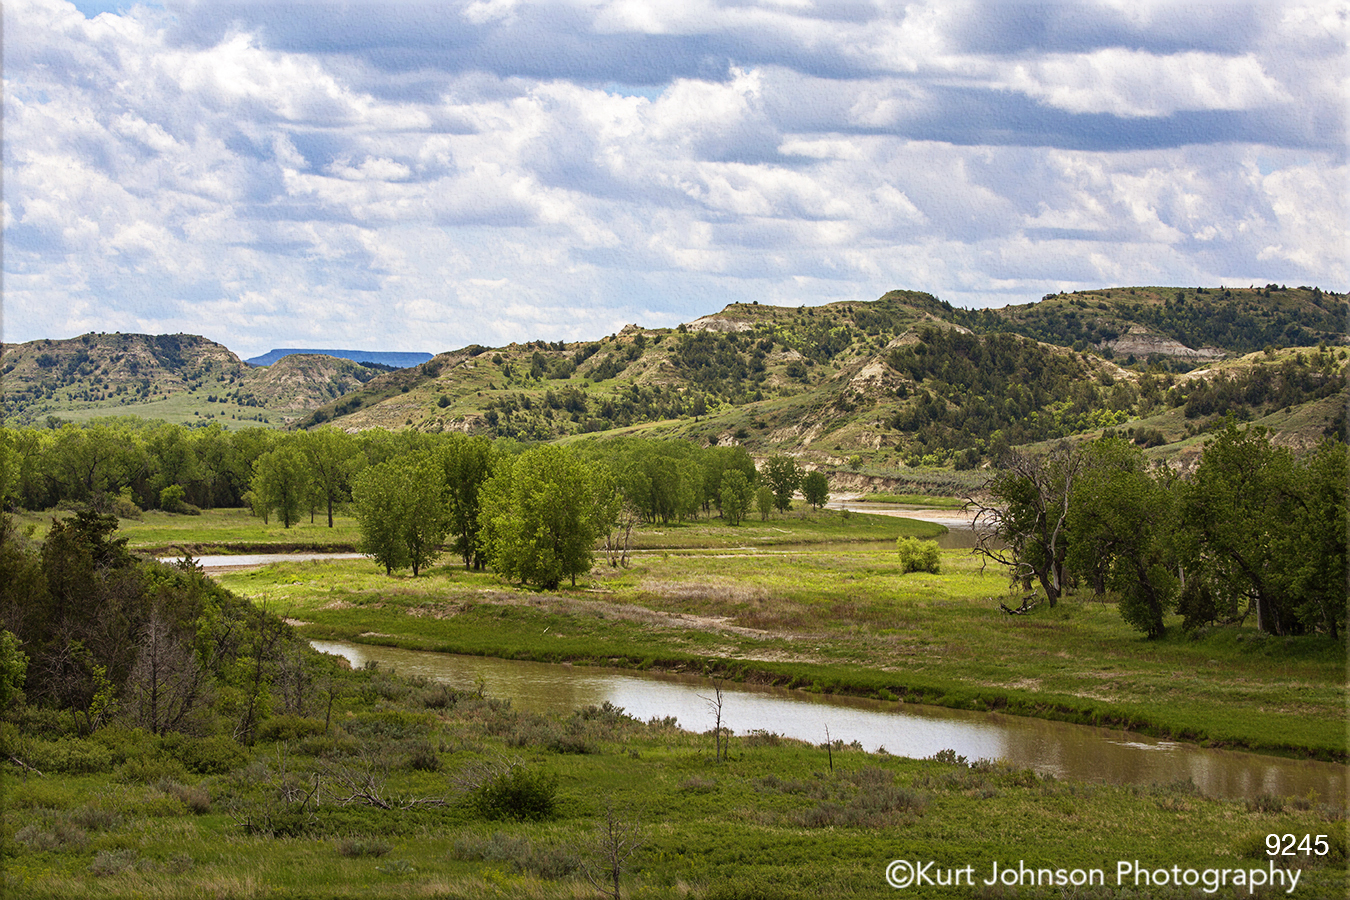 landscape water river mountains green grasses trees dakota clouds